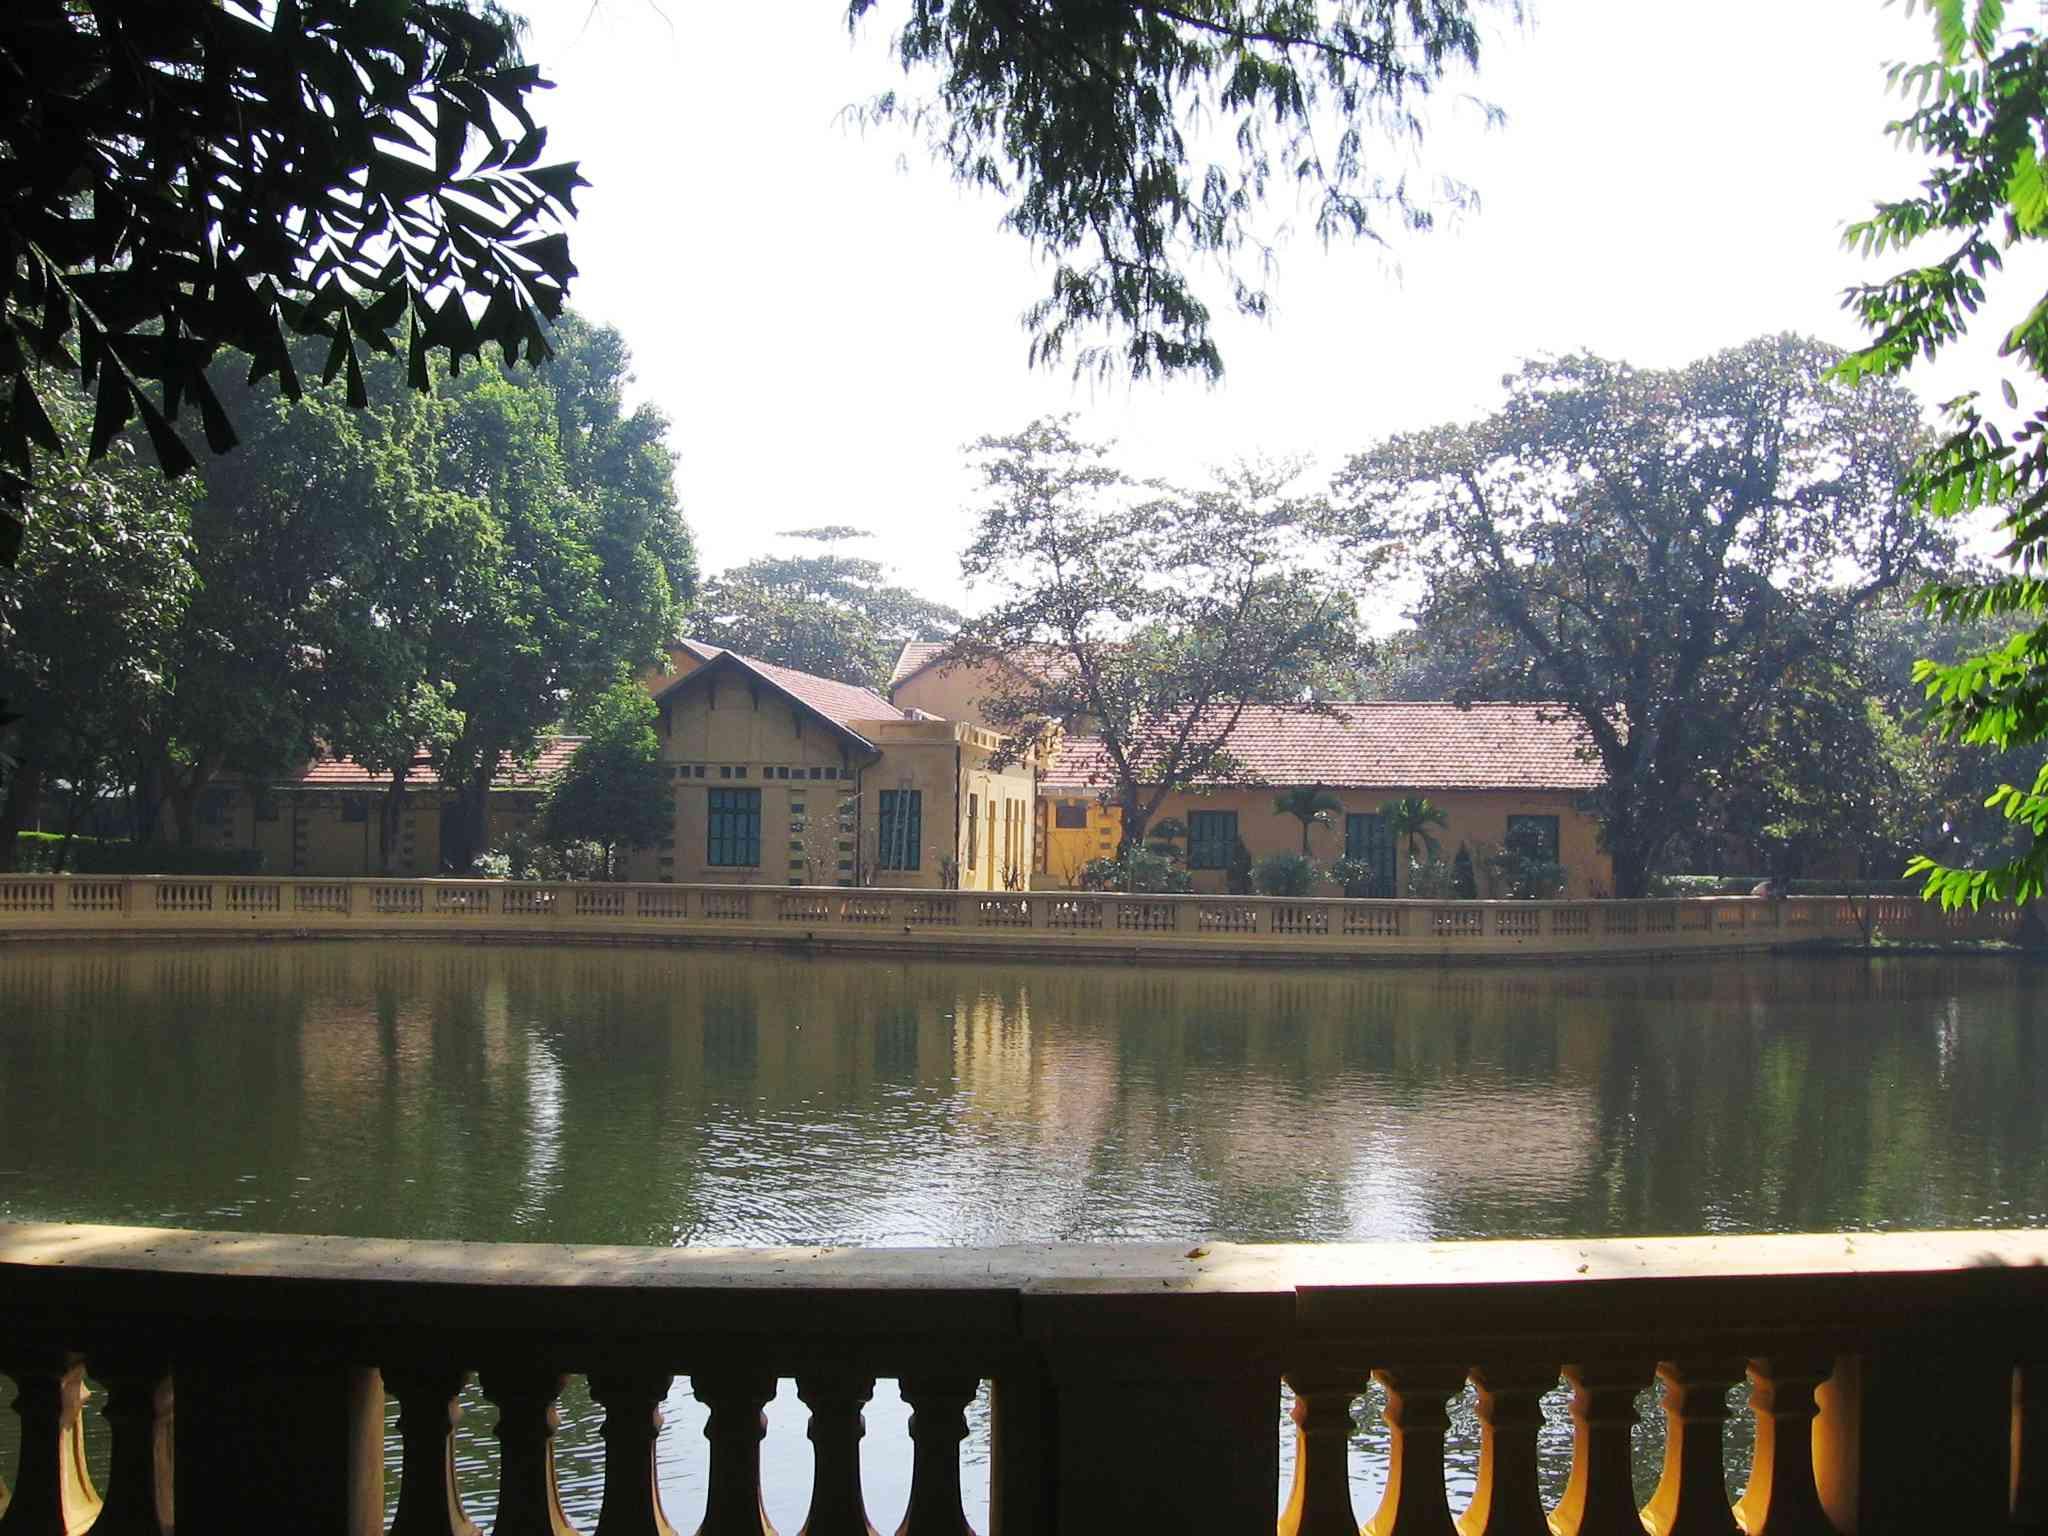 Pond in front of Ho Chi Minh Stilt House